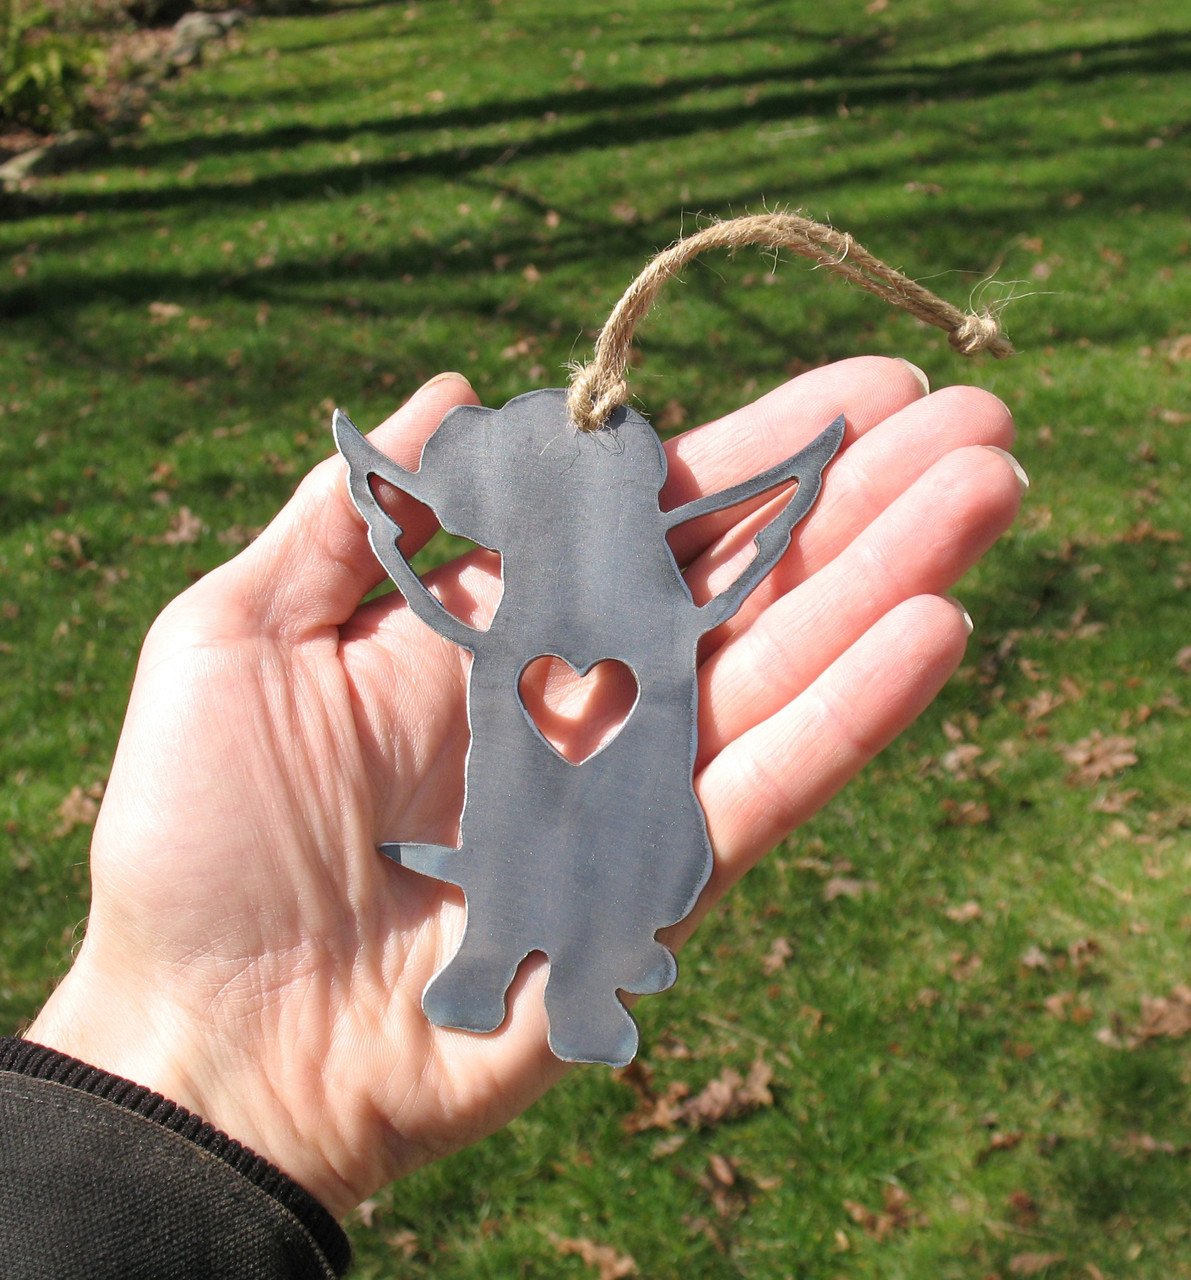 Mastiff Dog Ornament 1 Pet Memorial W/ Angel Wings - Pet Loss Dog Sympathy Remembrance Gift - Metal Dog Christmas Ornament